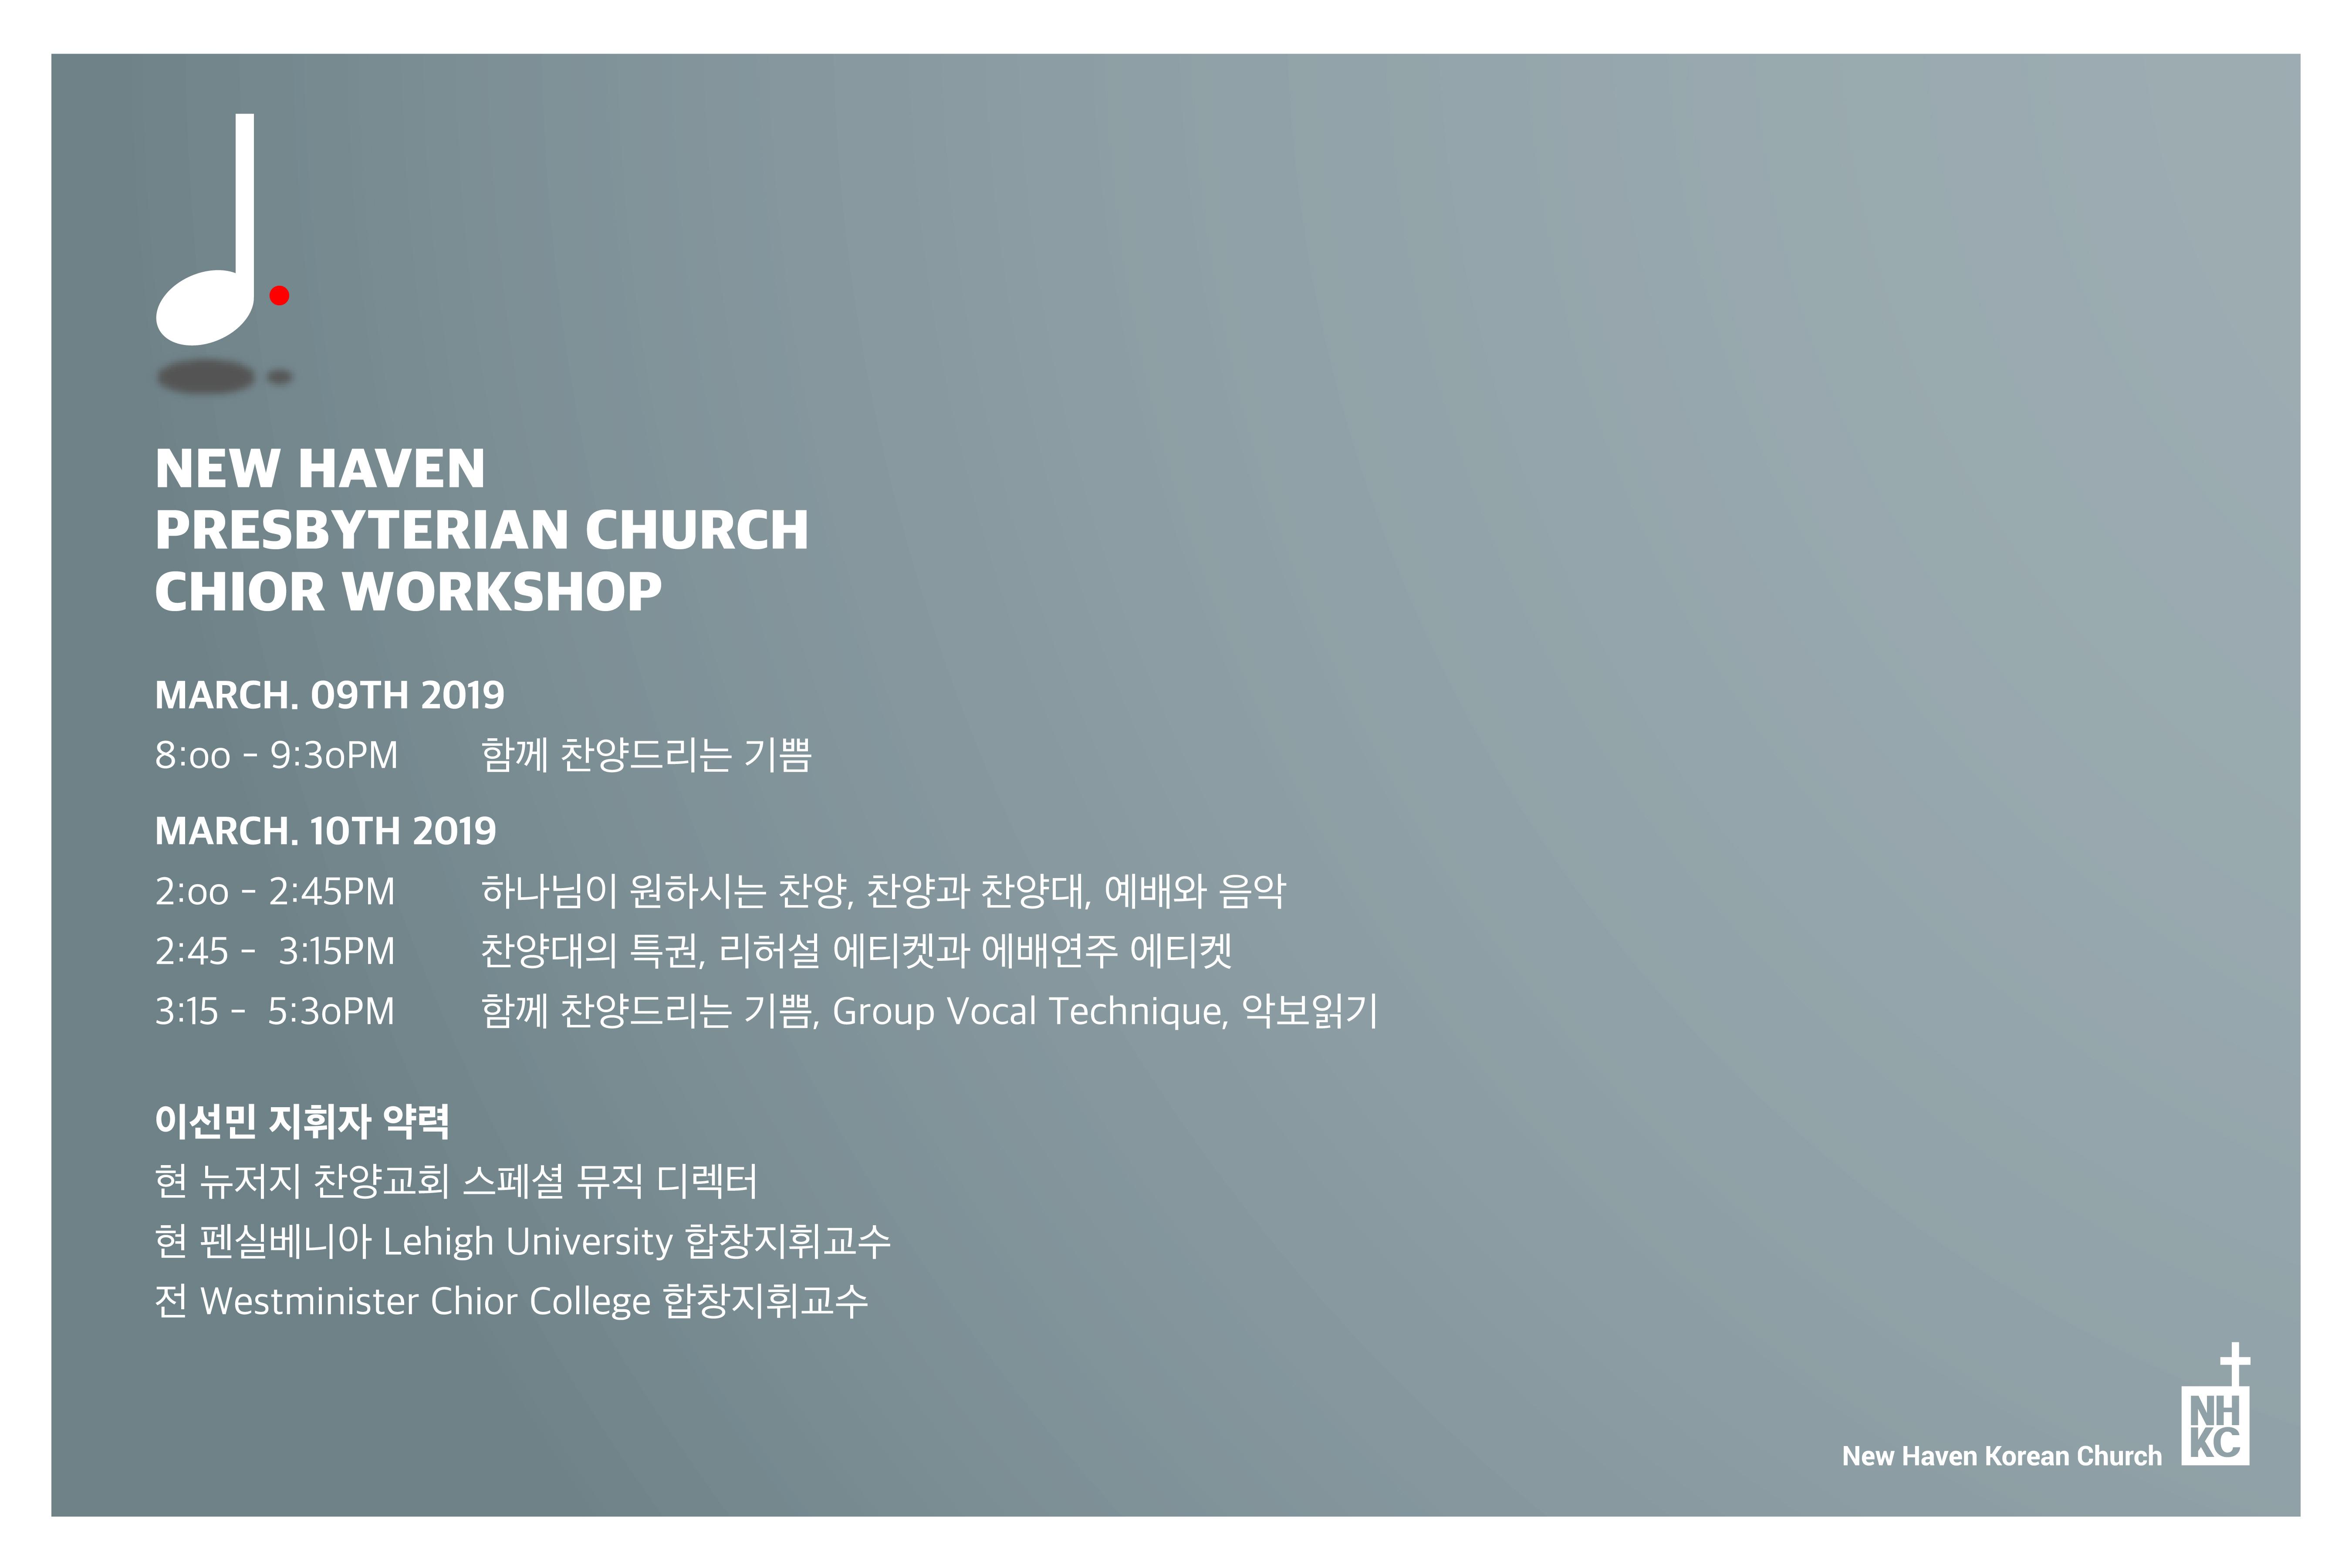 Church Chior Poster02.jpg